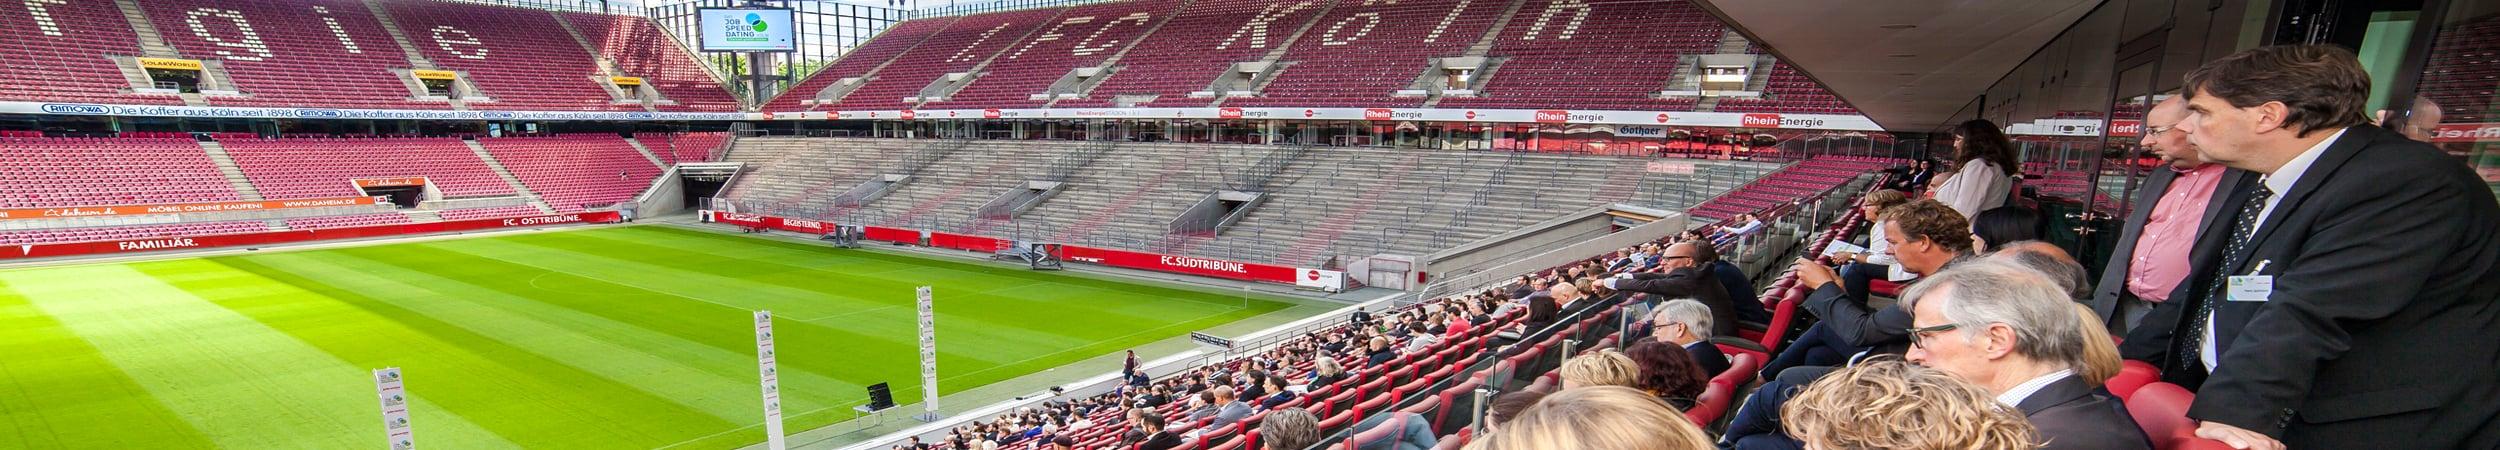 Rhein Energie Stadion - JSD